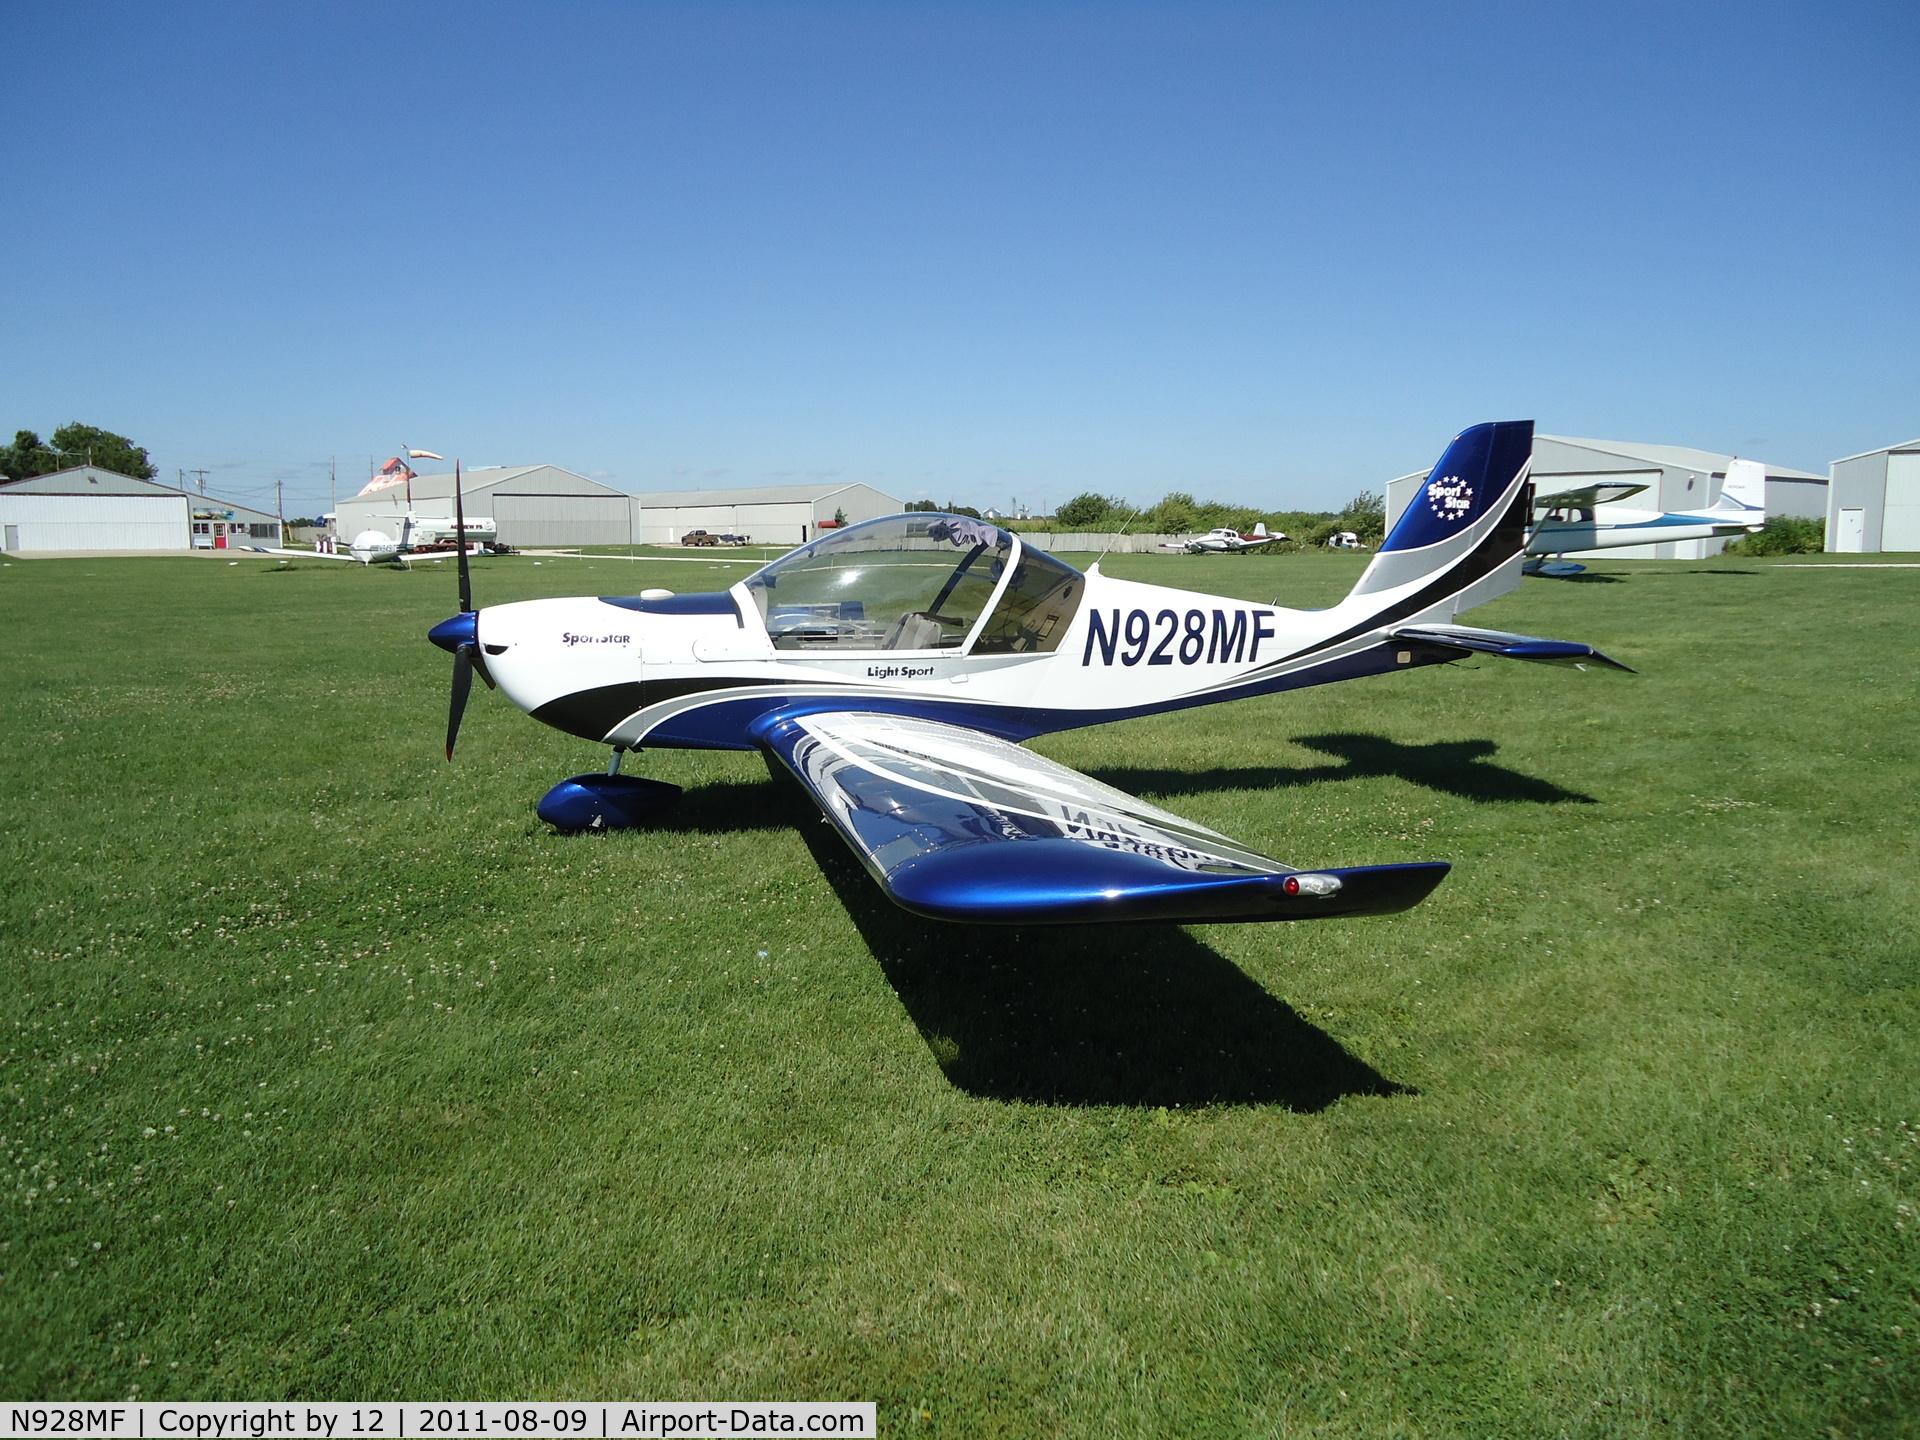 N928MF, 2007 Evektor-Aerotechnik SPORTSTAR PLUS C/N 20070928, at cushing field, Newark, IL